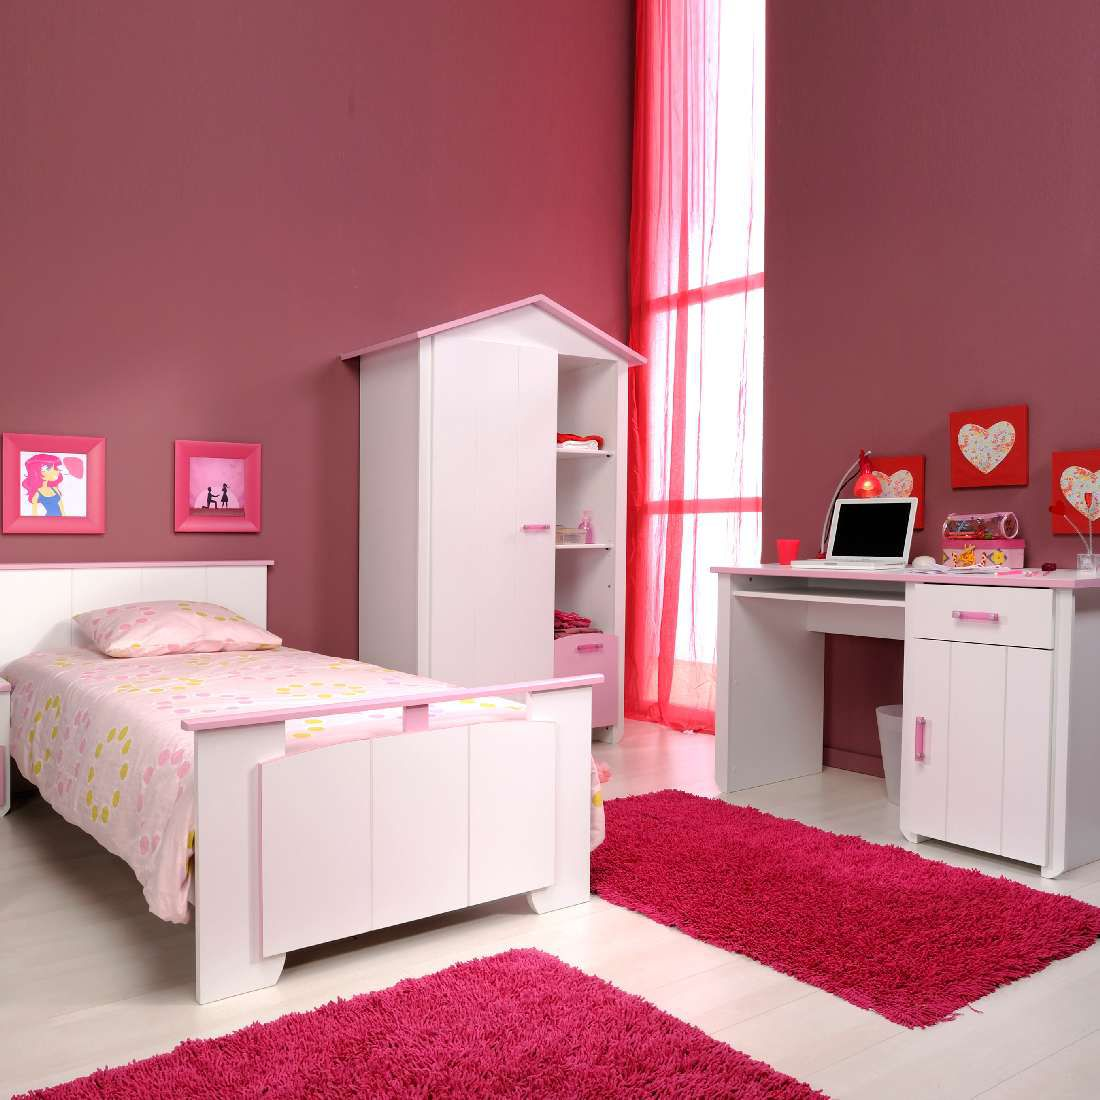 parisot fabric bureau prix et offres. Black Bedroom Furniture Sets. Home Design Ideas